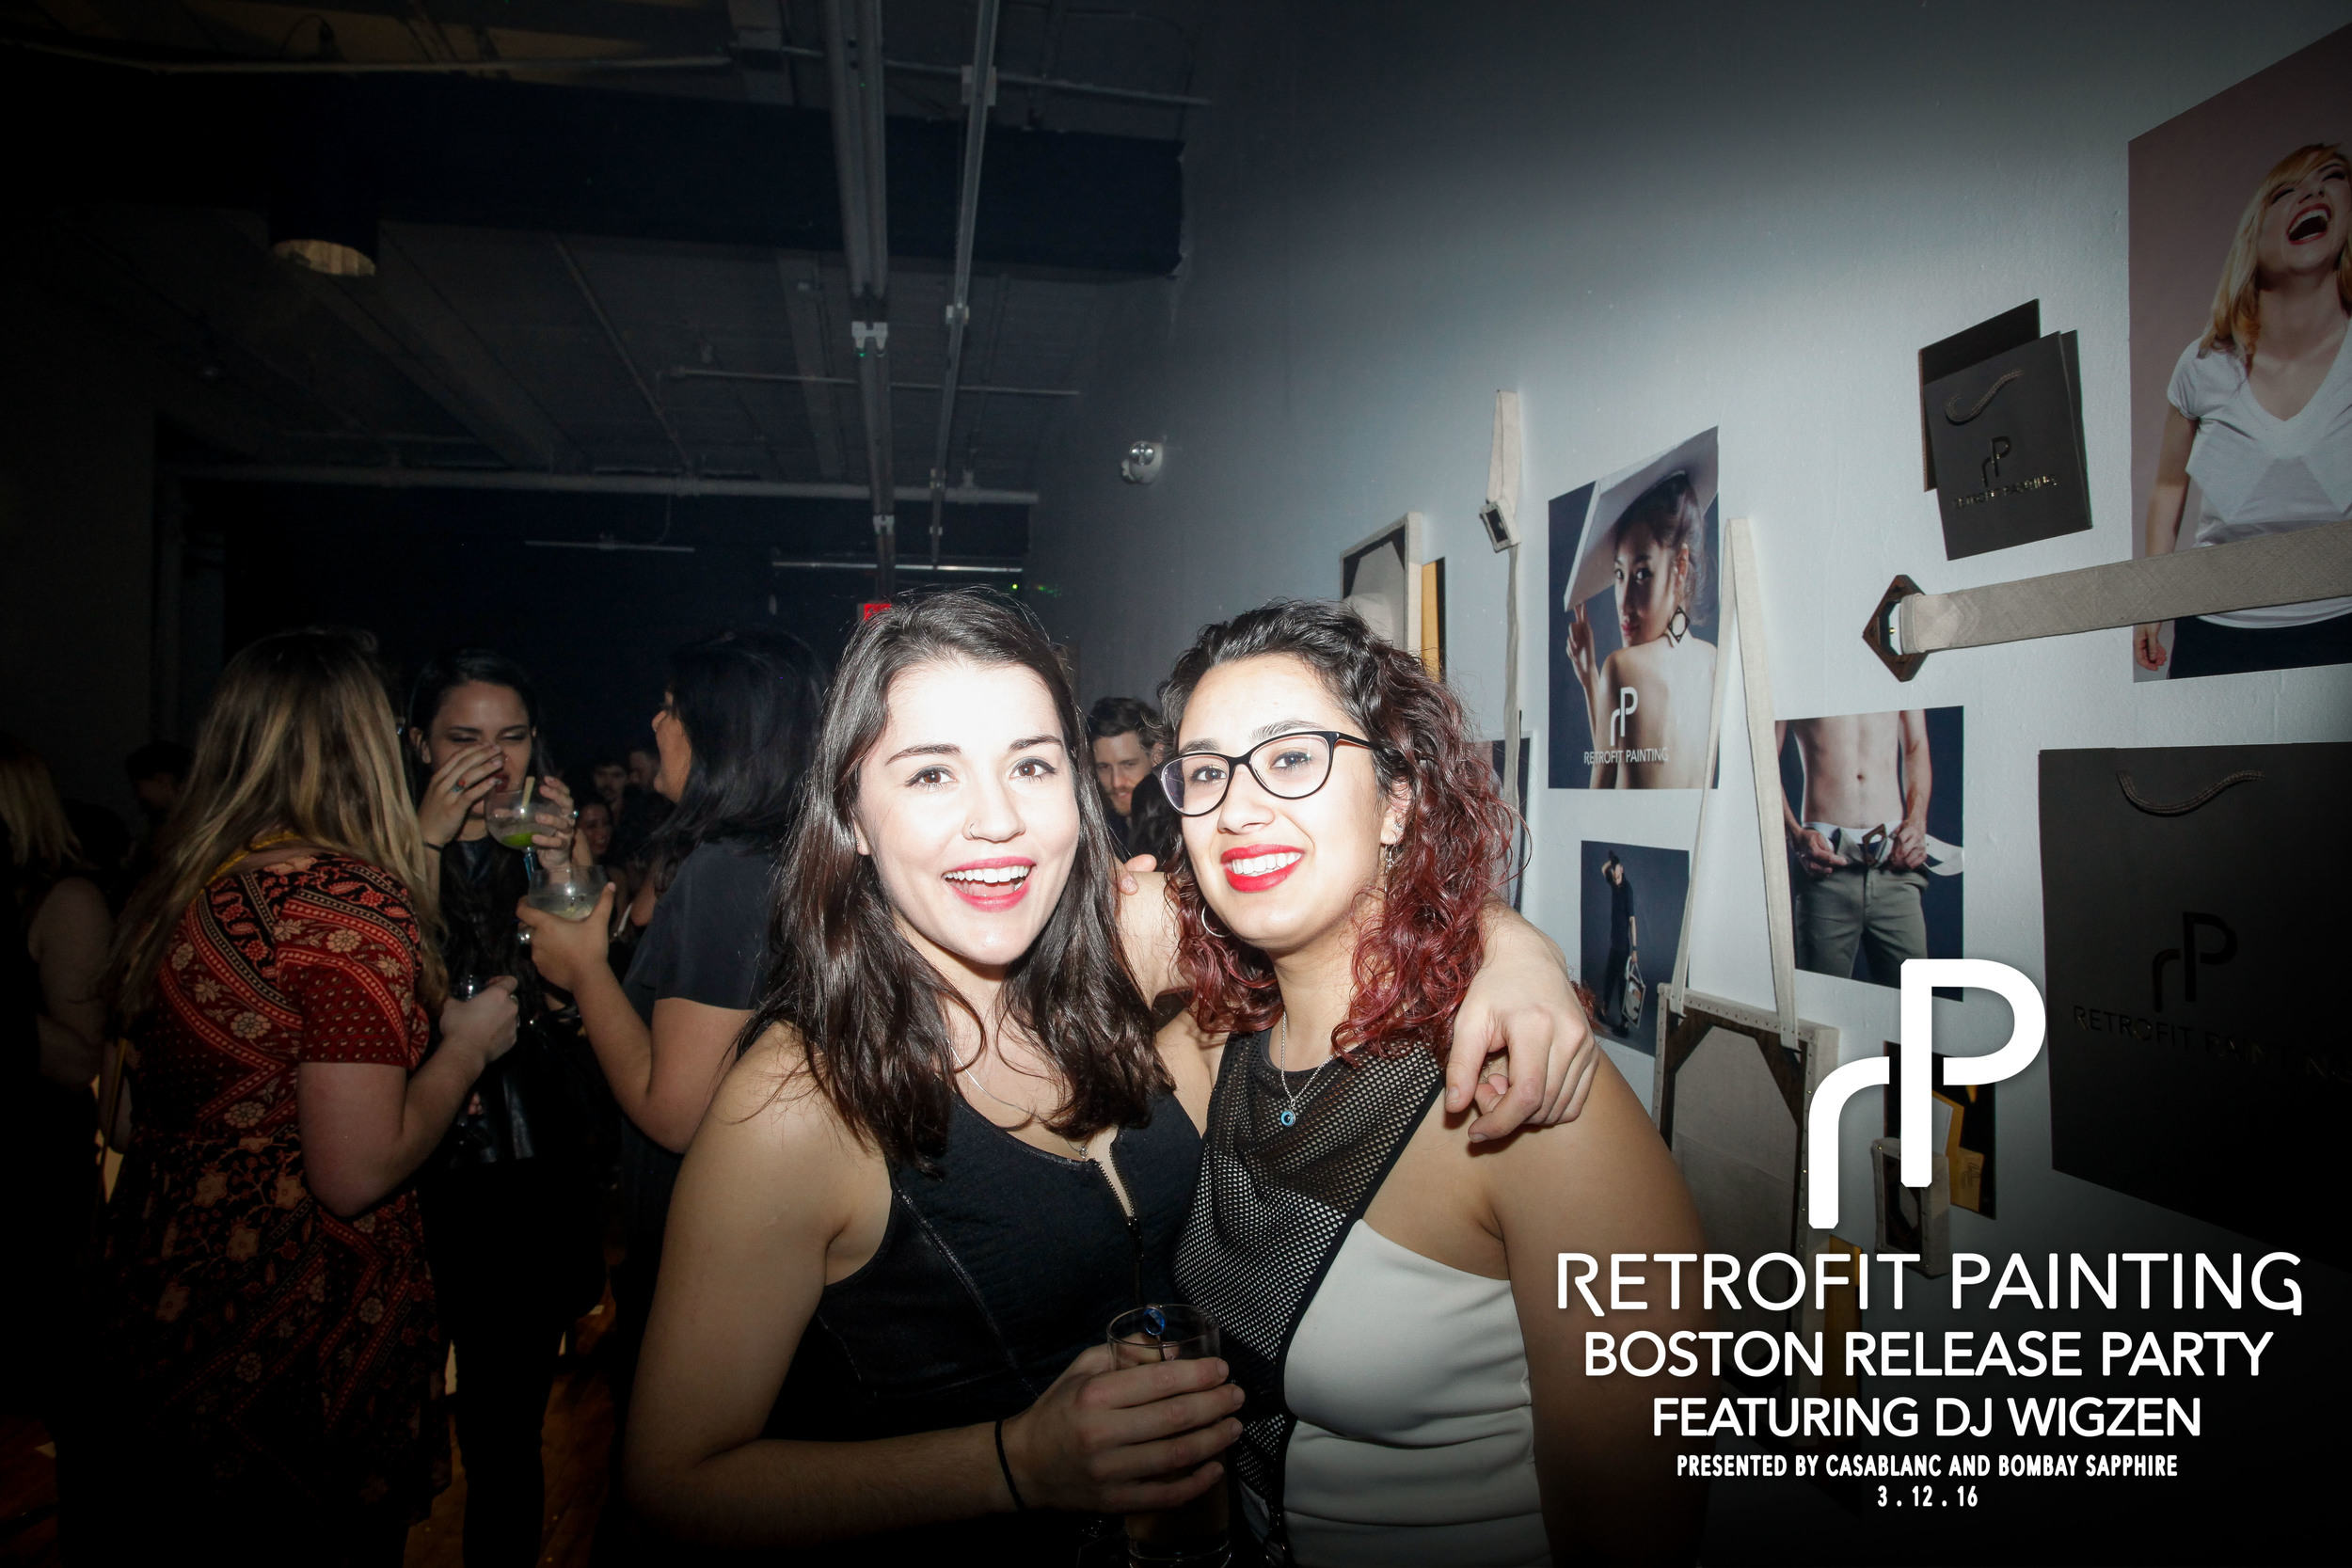 Retrofit Painting Boston Release Party 0112.jpg